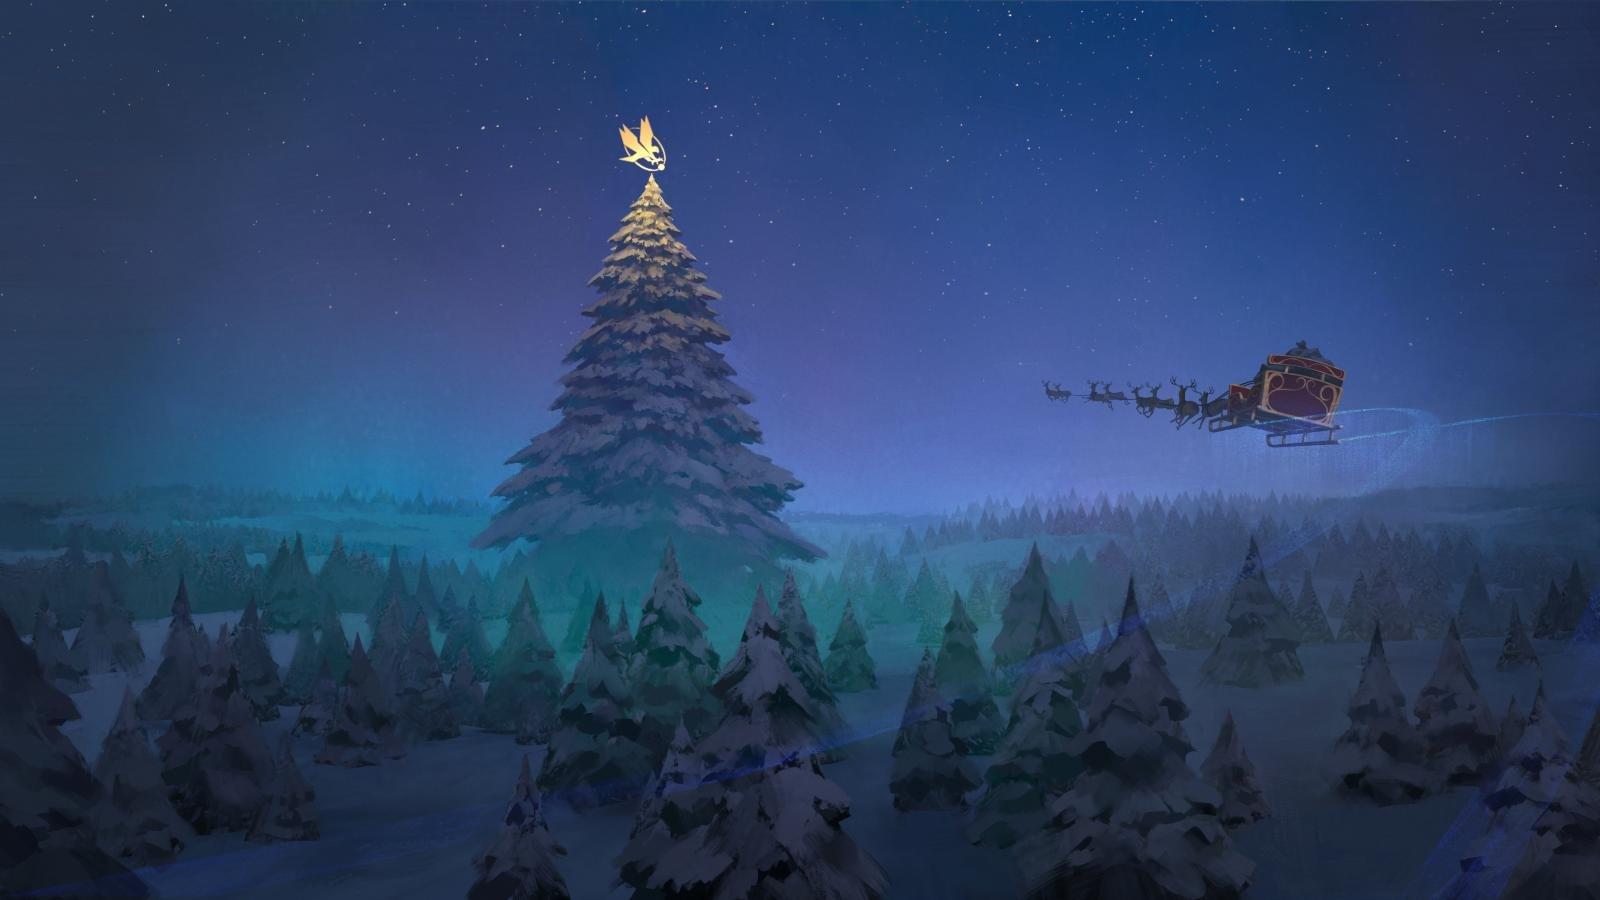 Christmas Desktop Pictures.Christmas Wallpapers 1600x900 Desktop Backgrounds